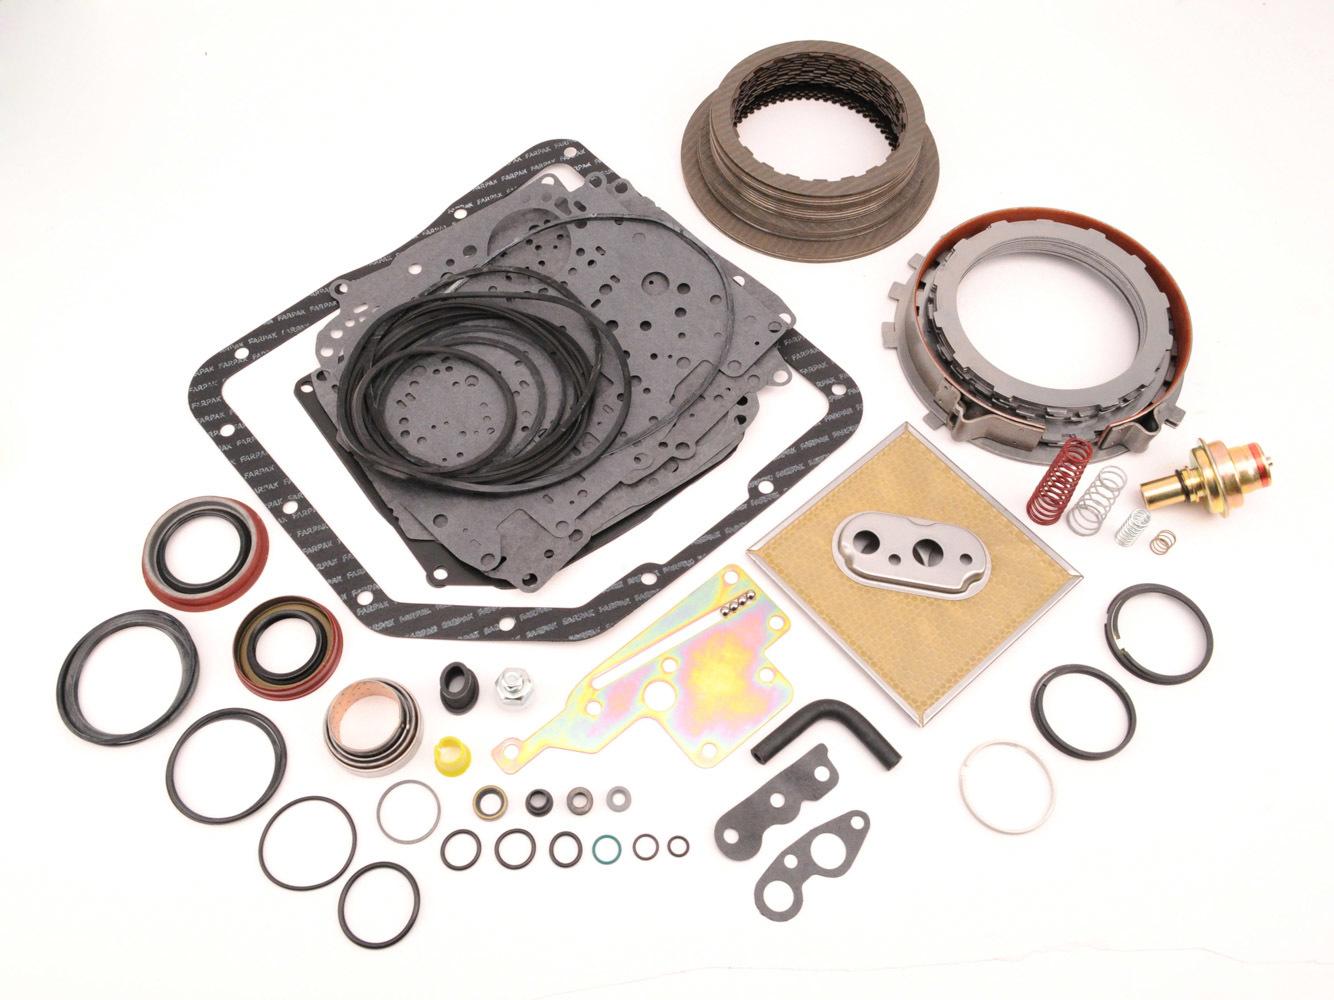 TCI 328800 Transmission Rebuild Kit, Automatic, Pro Super, Clutches / Bands / Filter / Gaskets / Seals, Modulator, Valve Body, TH350, Kit